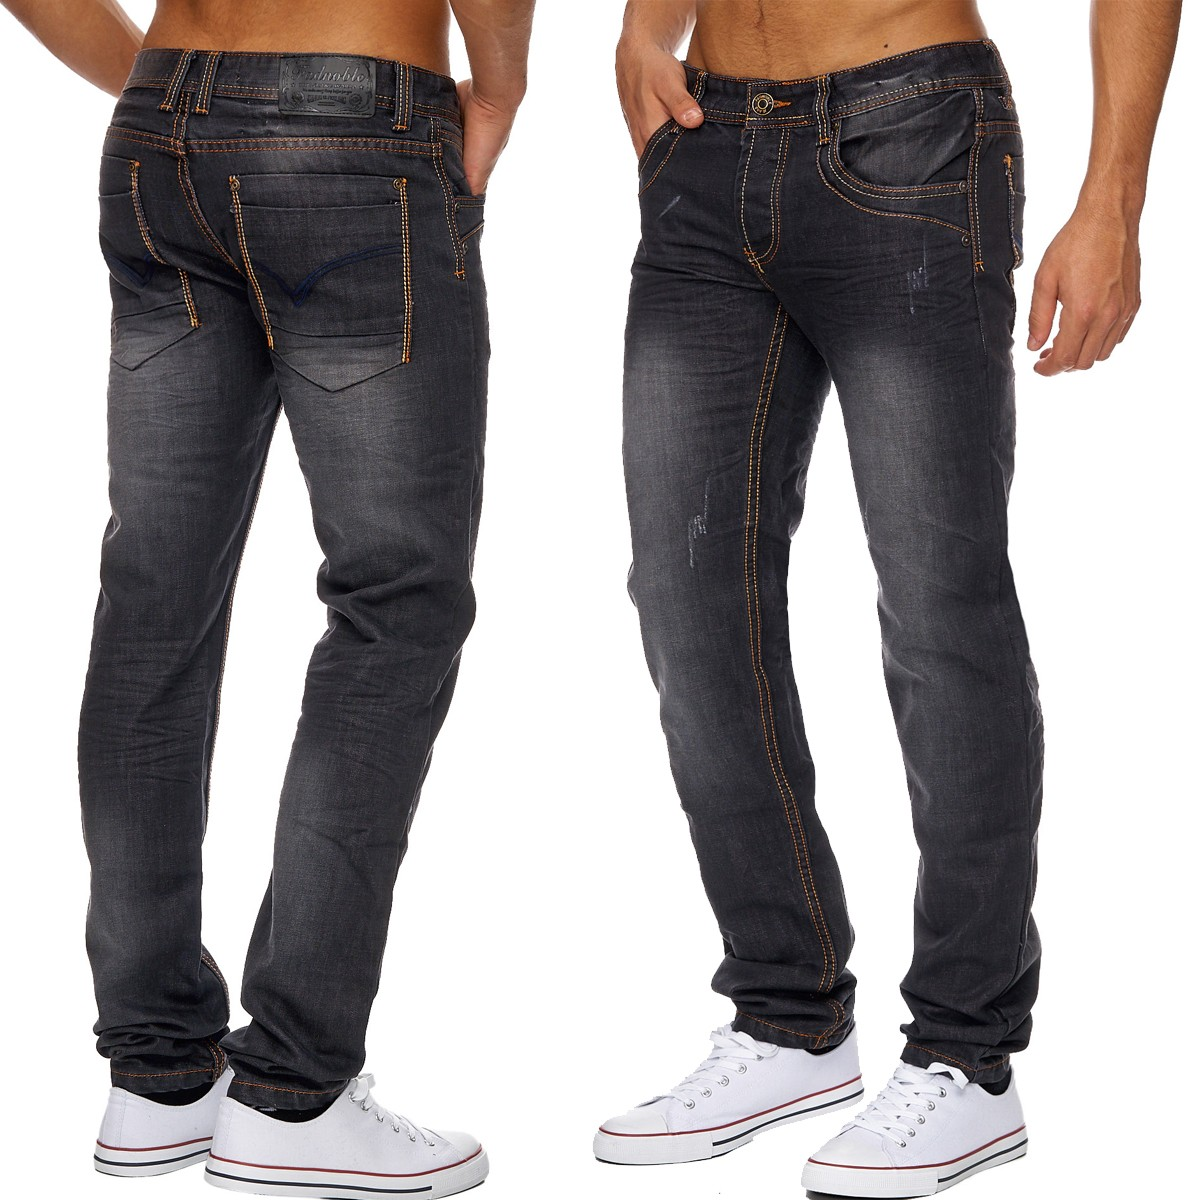 herren jeans classic ziernaht grau ronny 1817. Black Bedroom Furniture Sets. Home Design Ideas